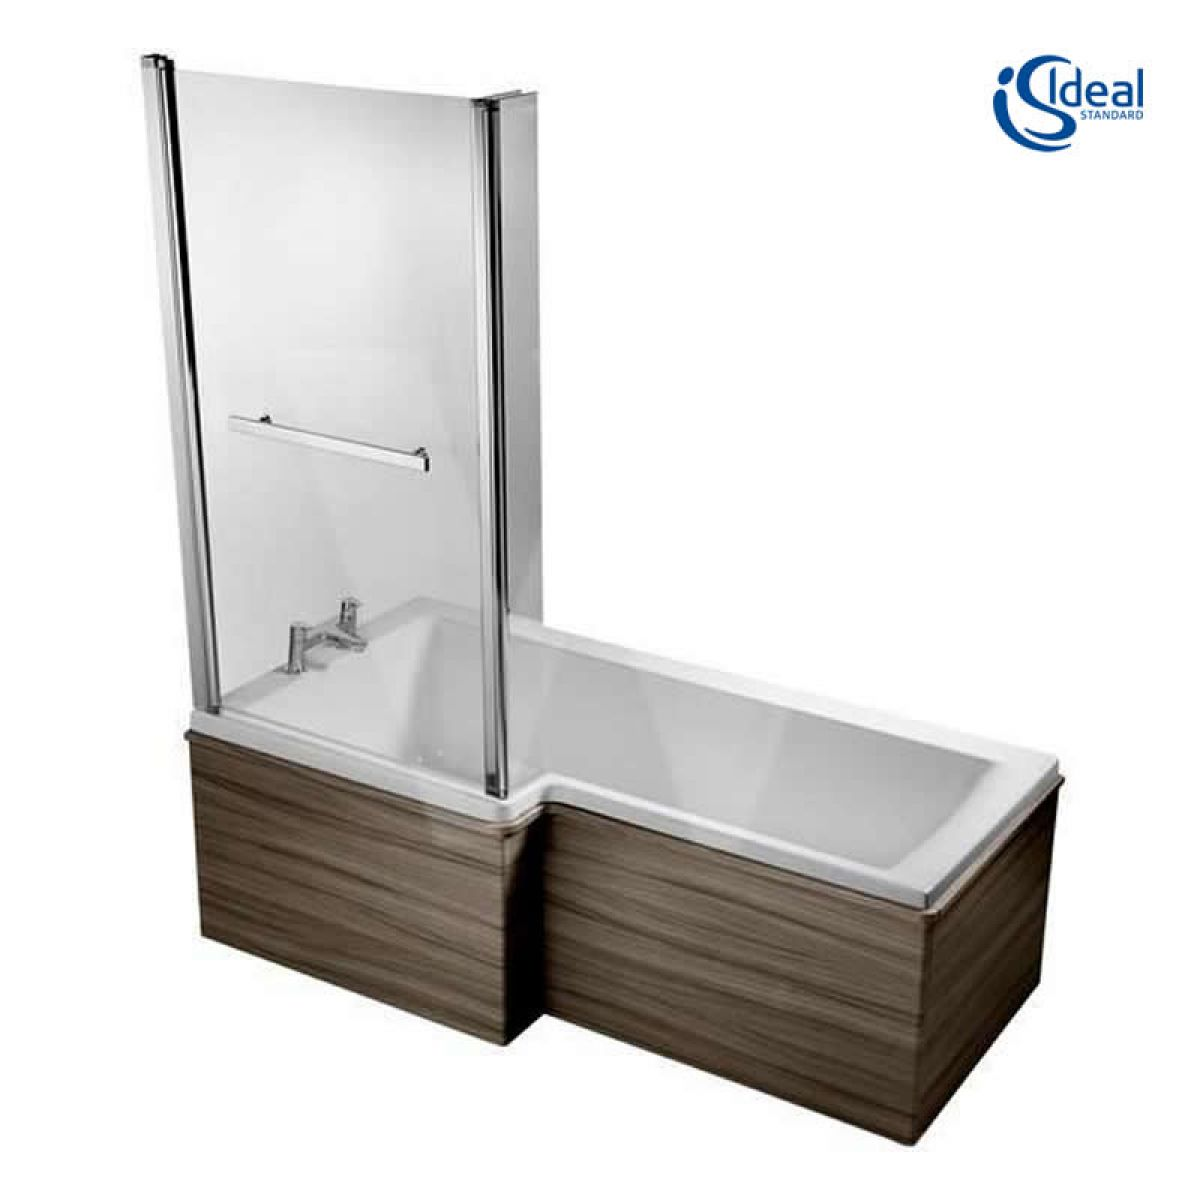 ideal standard concept space 1700mm square shower bath